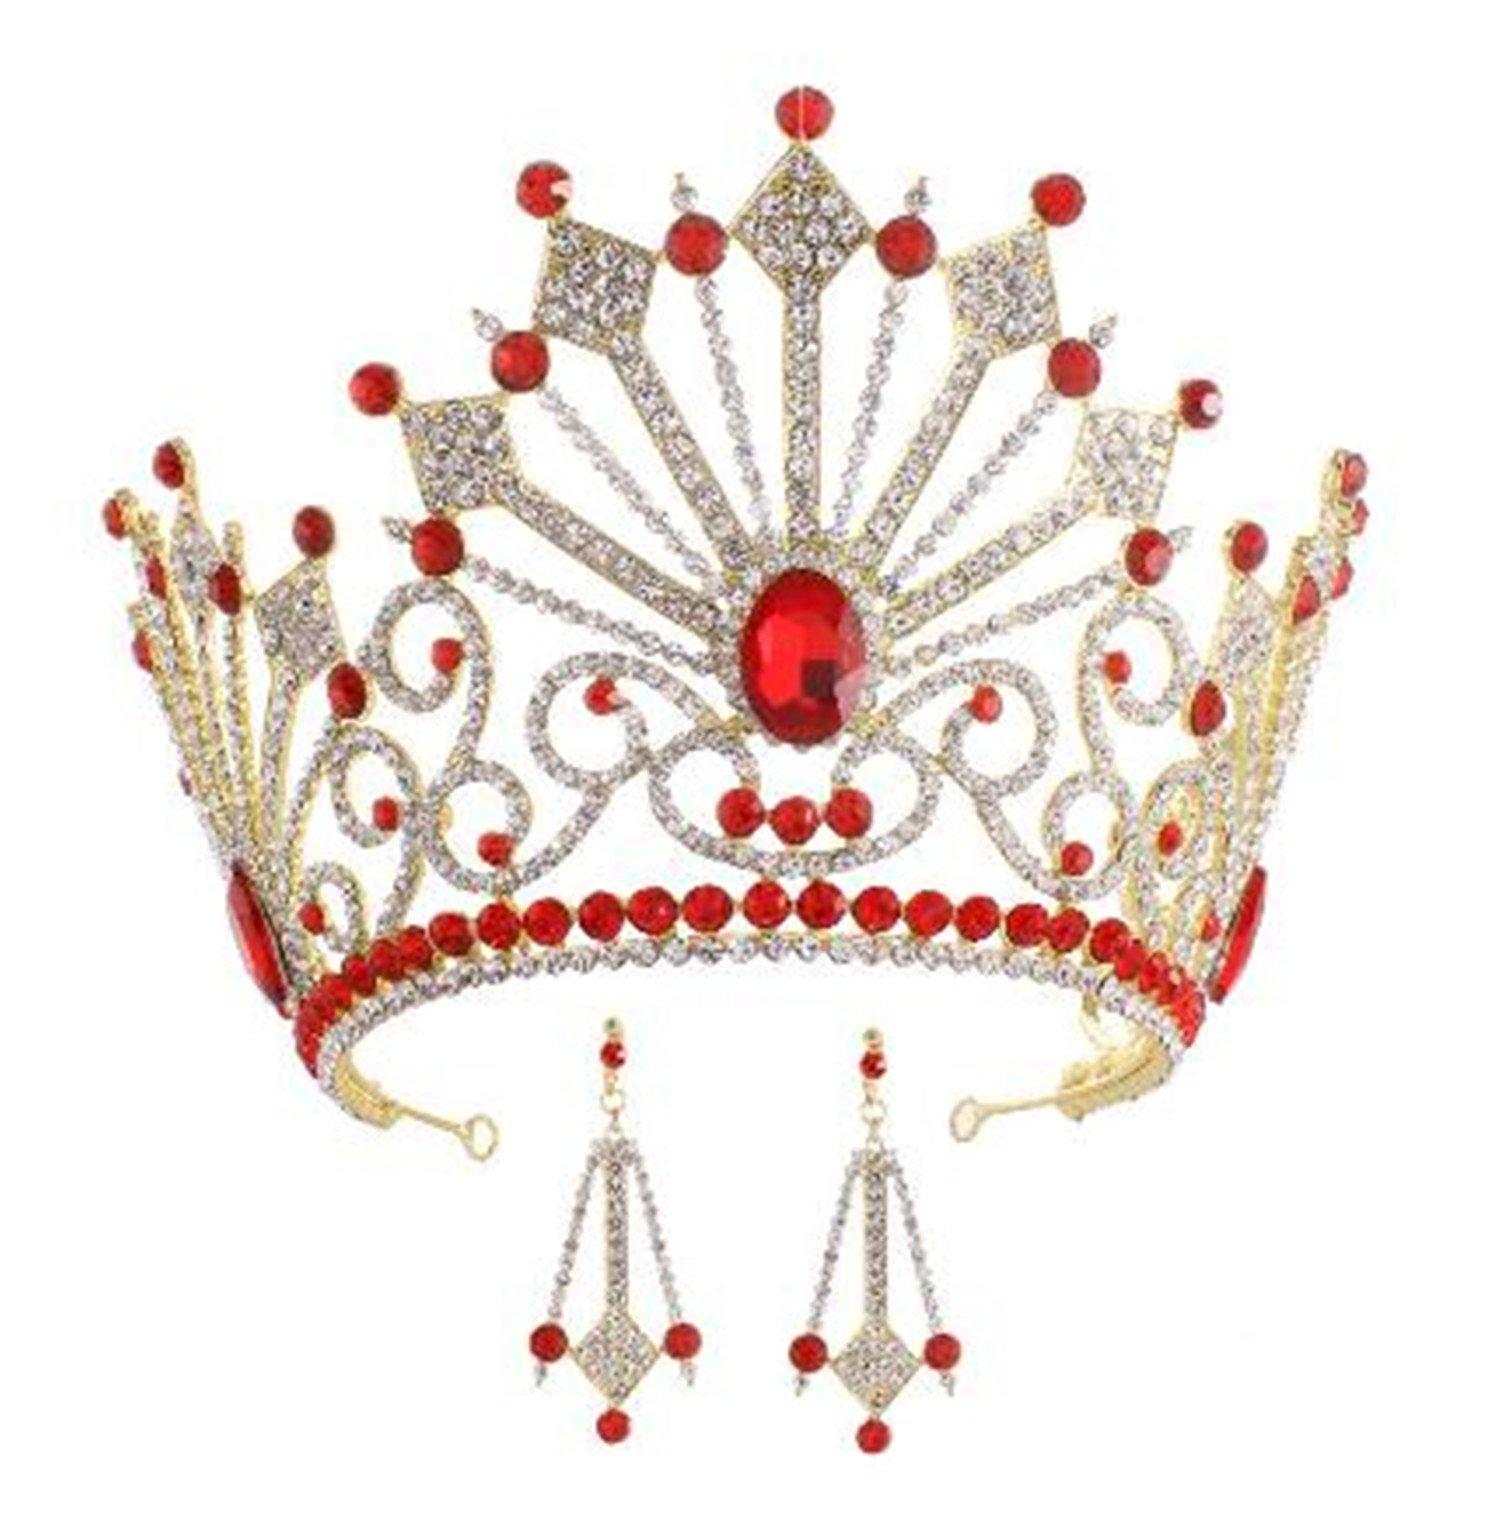 Wiipu Luxury Bridal Wedding Rhinestone Crystal Tall Crown Oversize Headbands Tiaras(A1233) (Red)